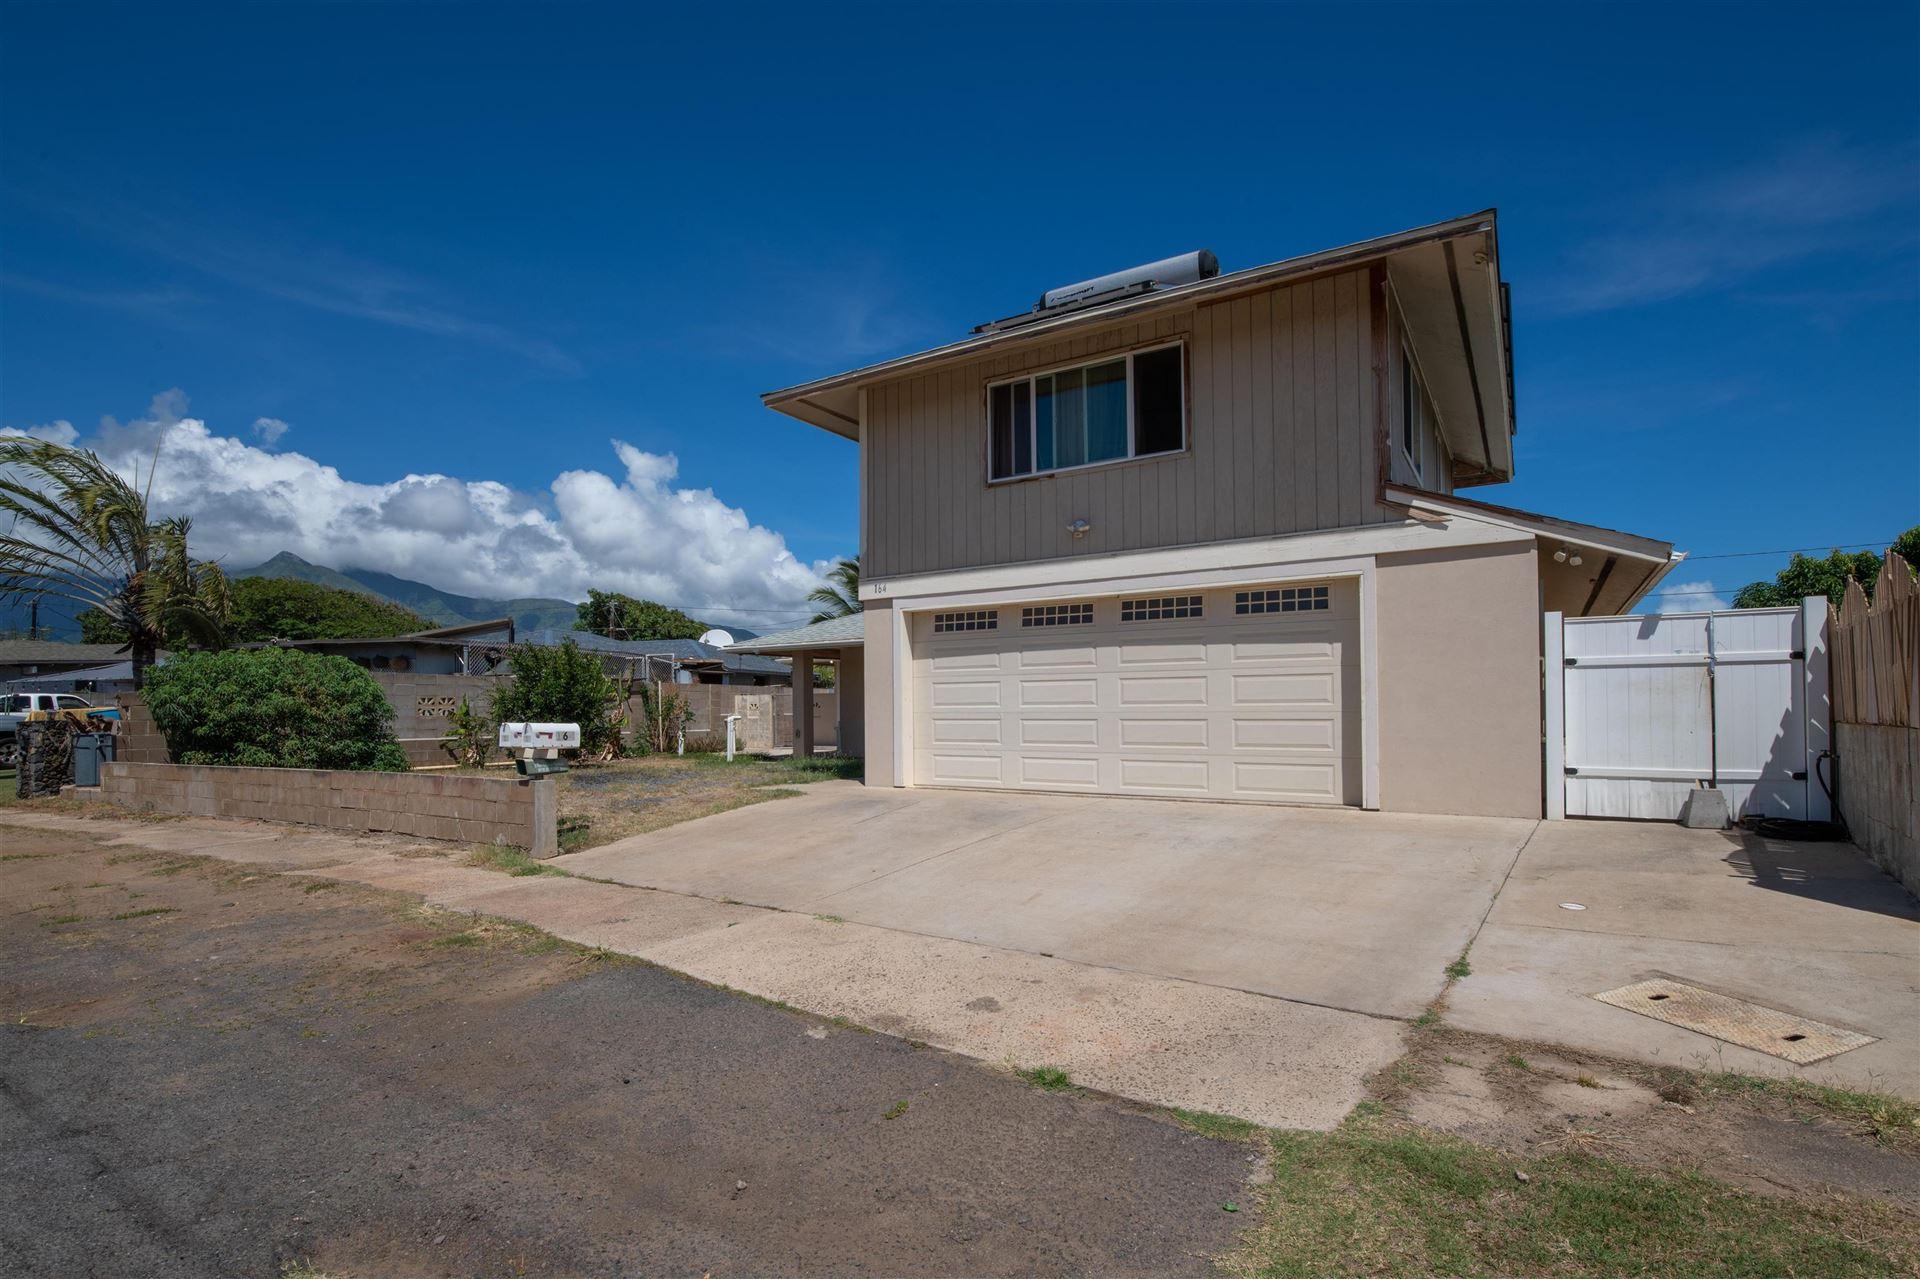 Photo of 164 W Kauai St, Kahului, HI 96732-2839 (MLS # 392974)